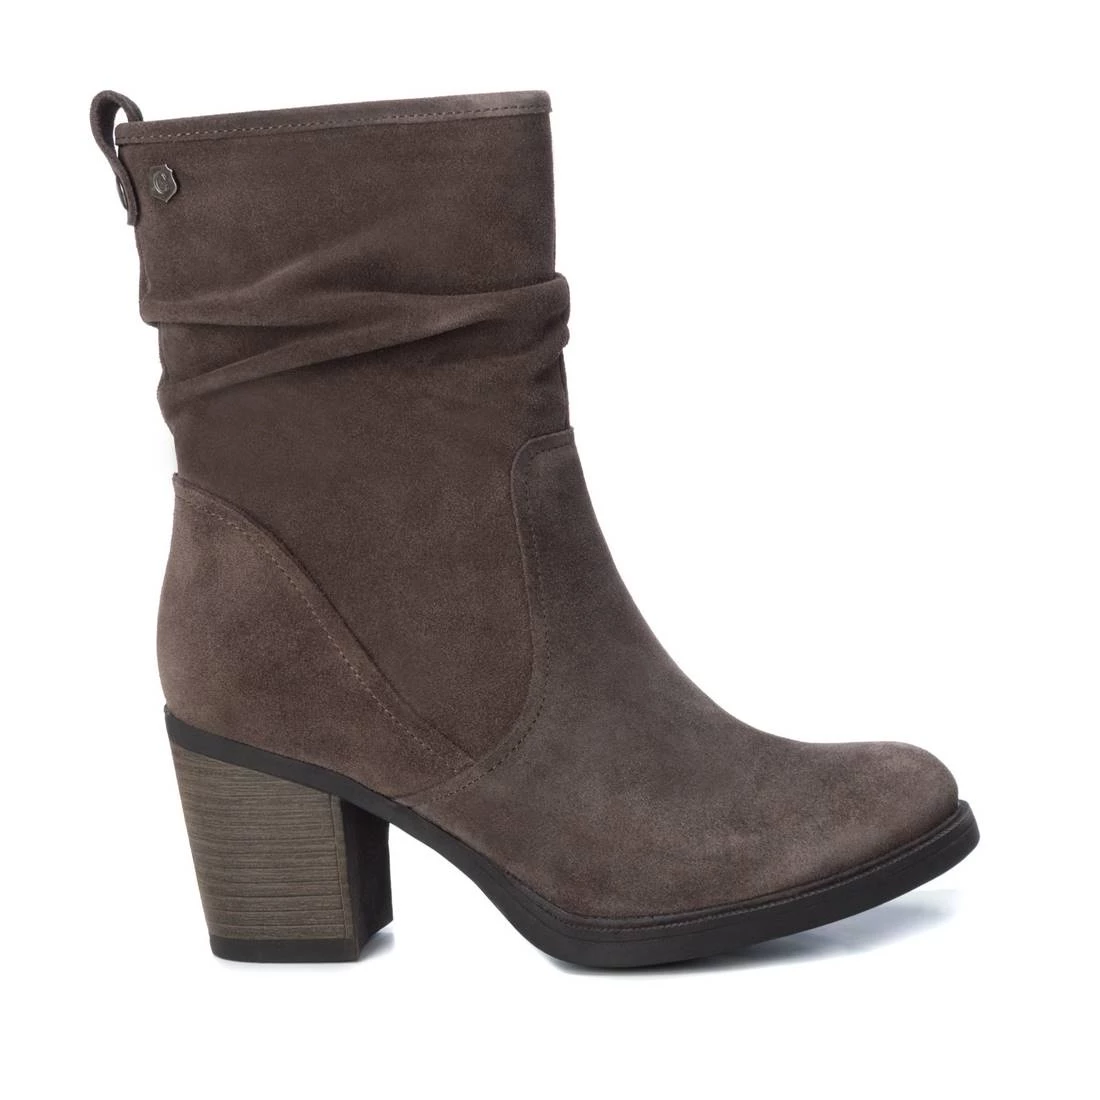 Carmela 67080 Taupe Suede Mid Calf Heeled Stiefel